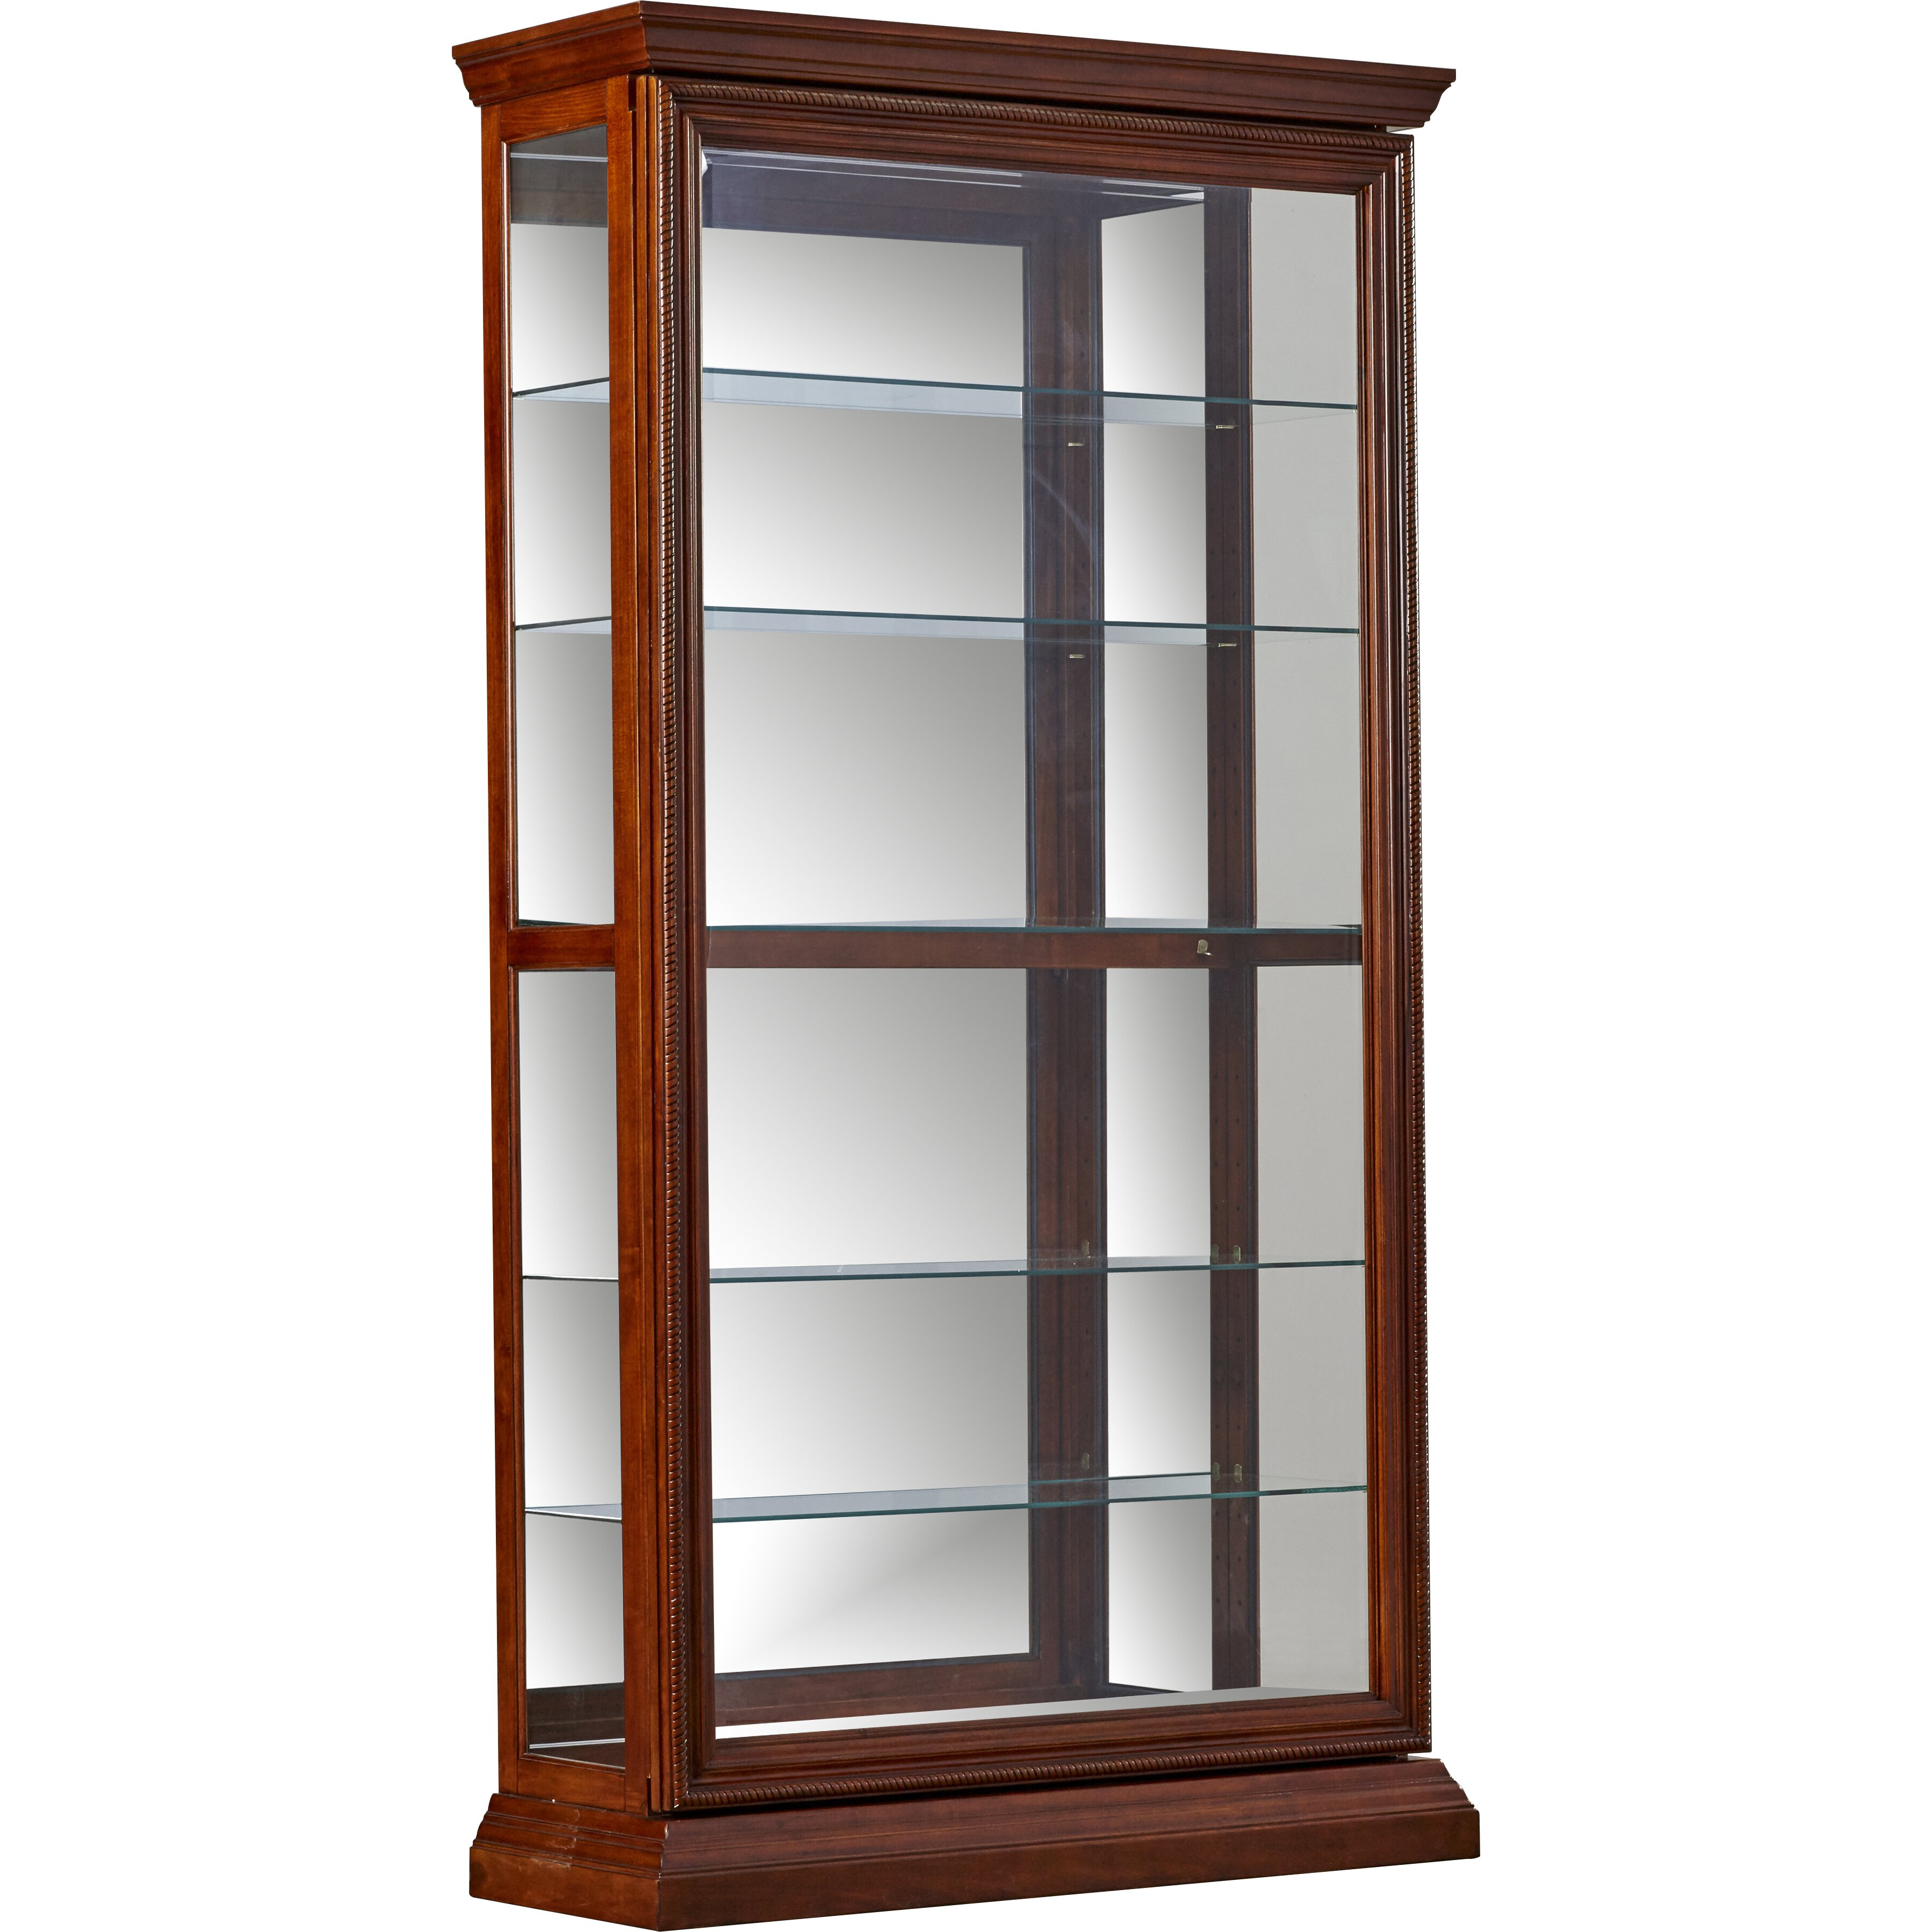 Darby Home Co Purvoche Curio Cabinet Amp Reviews Wayfair Ca